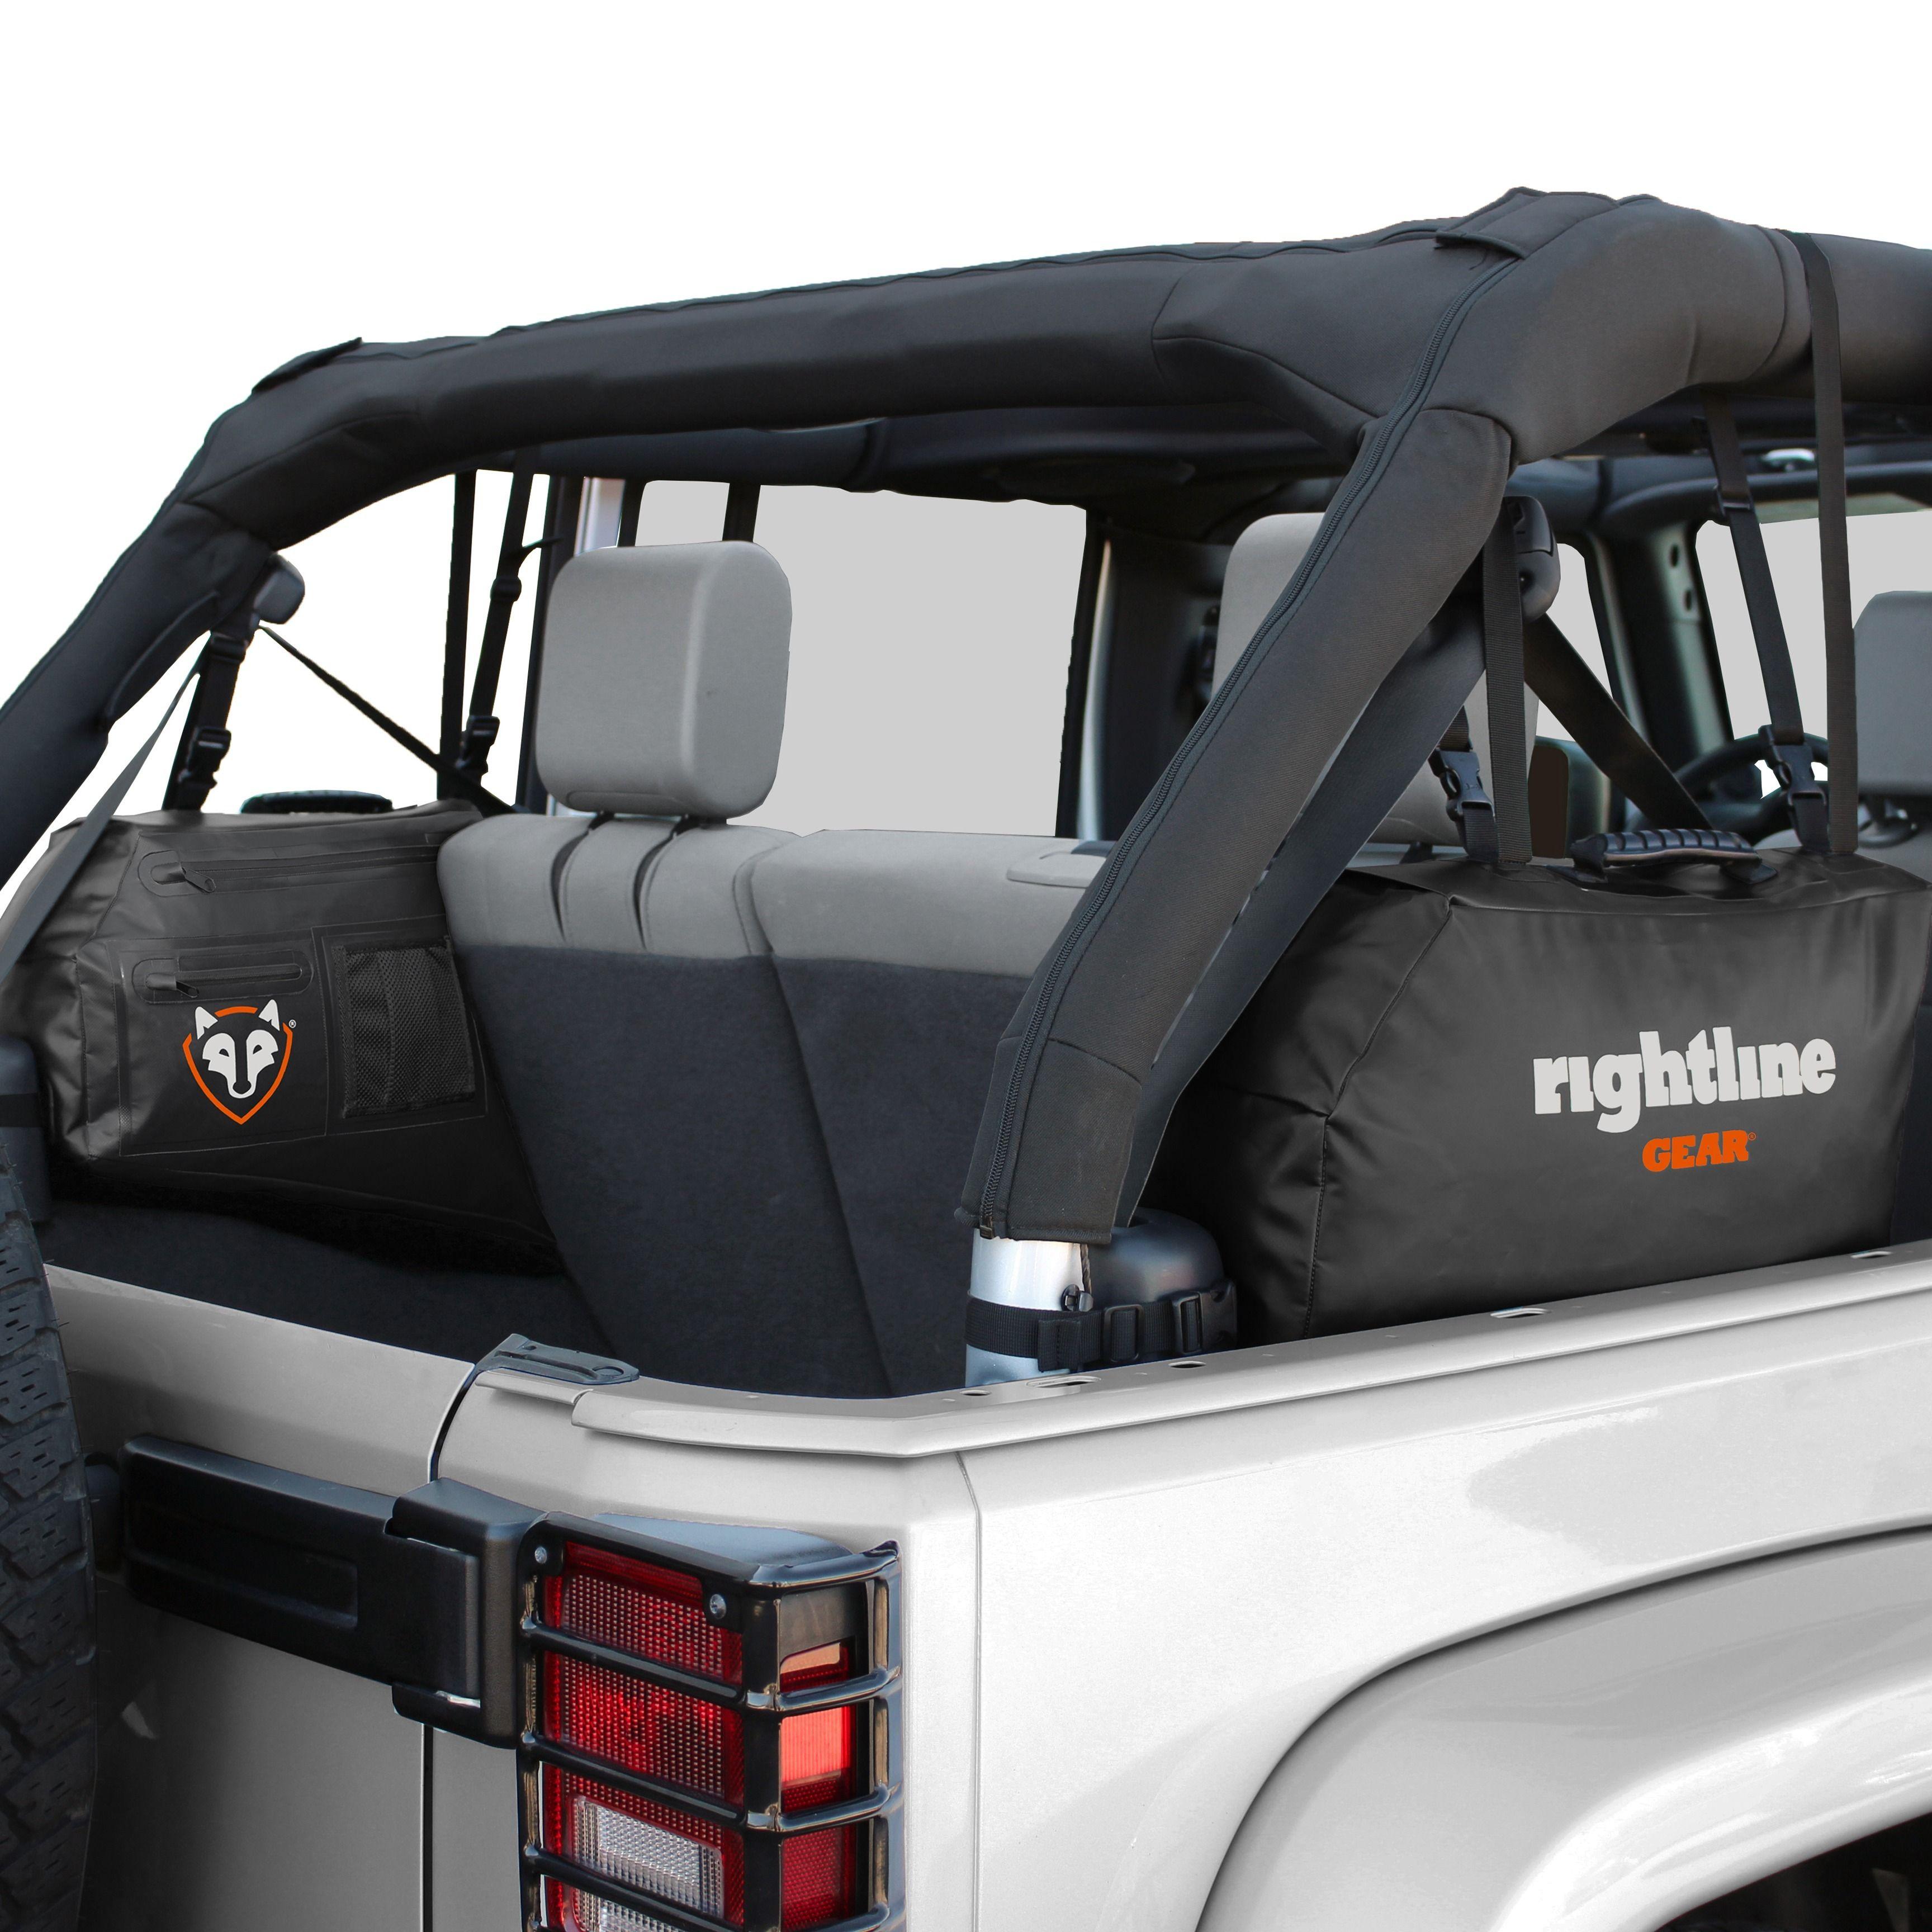 Rightline gear side storage bags by rightline gear storage